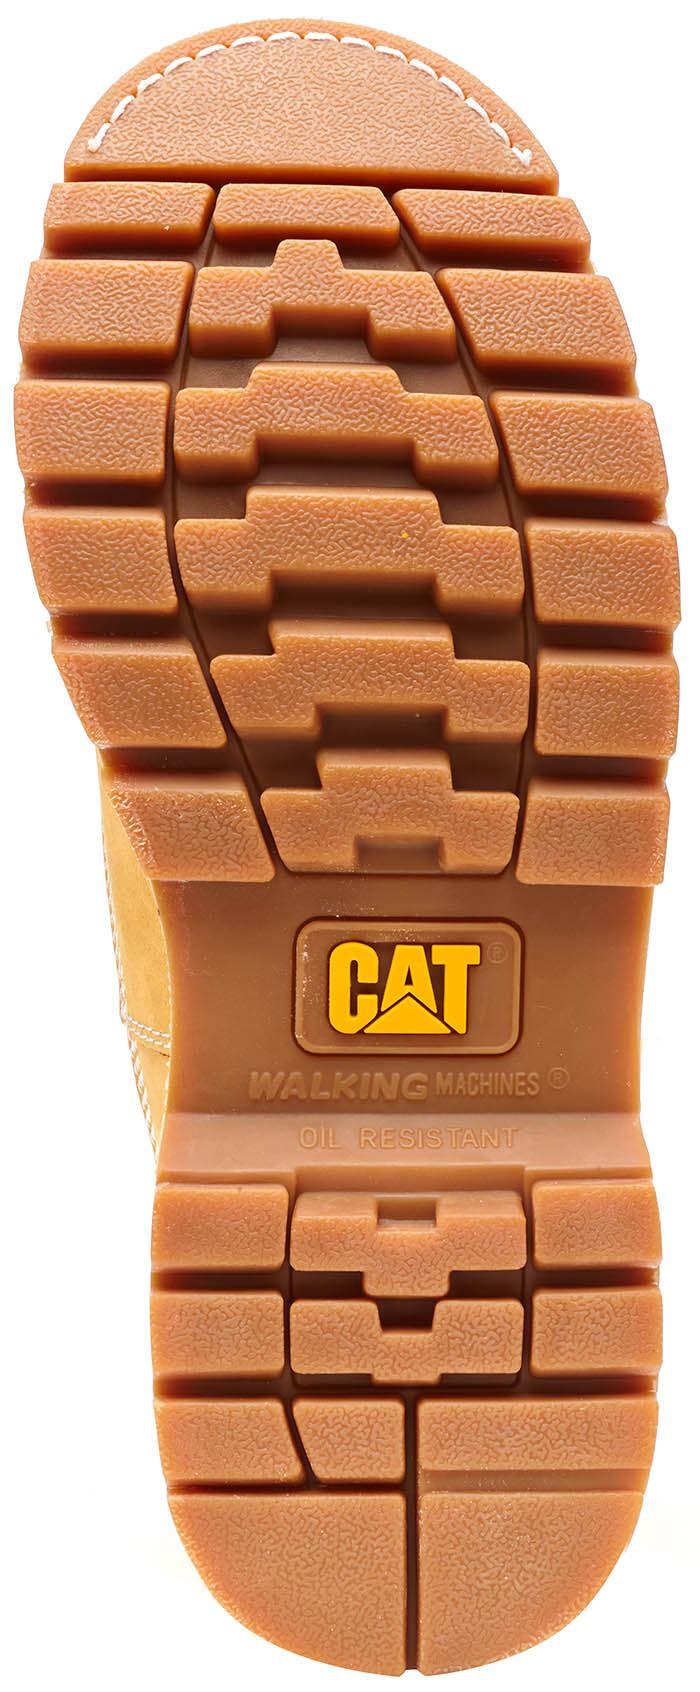 Caterpillar-Chat-Colorado-Bottes-dans-Royal-Marron-amp-Miel-Ble